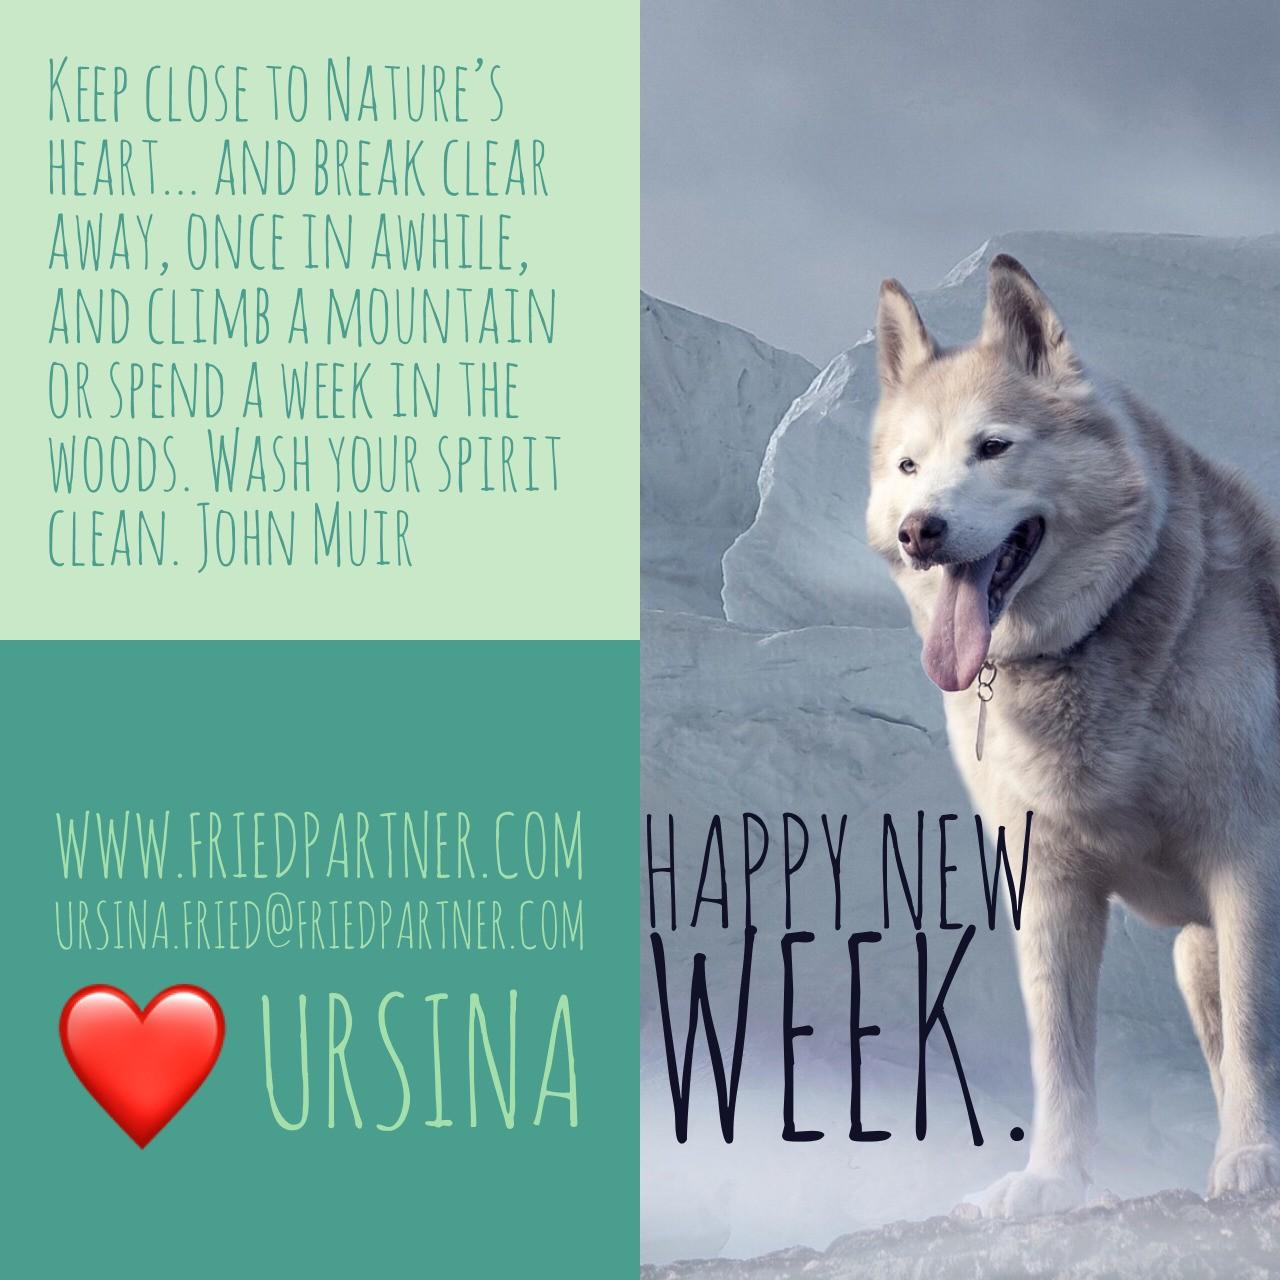 Have a wonderful week. ❤️ Ursina #nature #shamanichealing #hypnosis #nlpmaster #lifecoaching